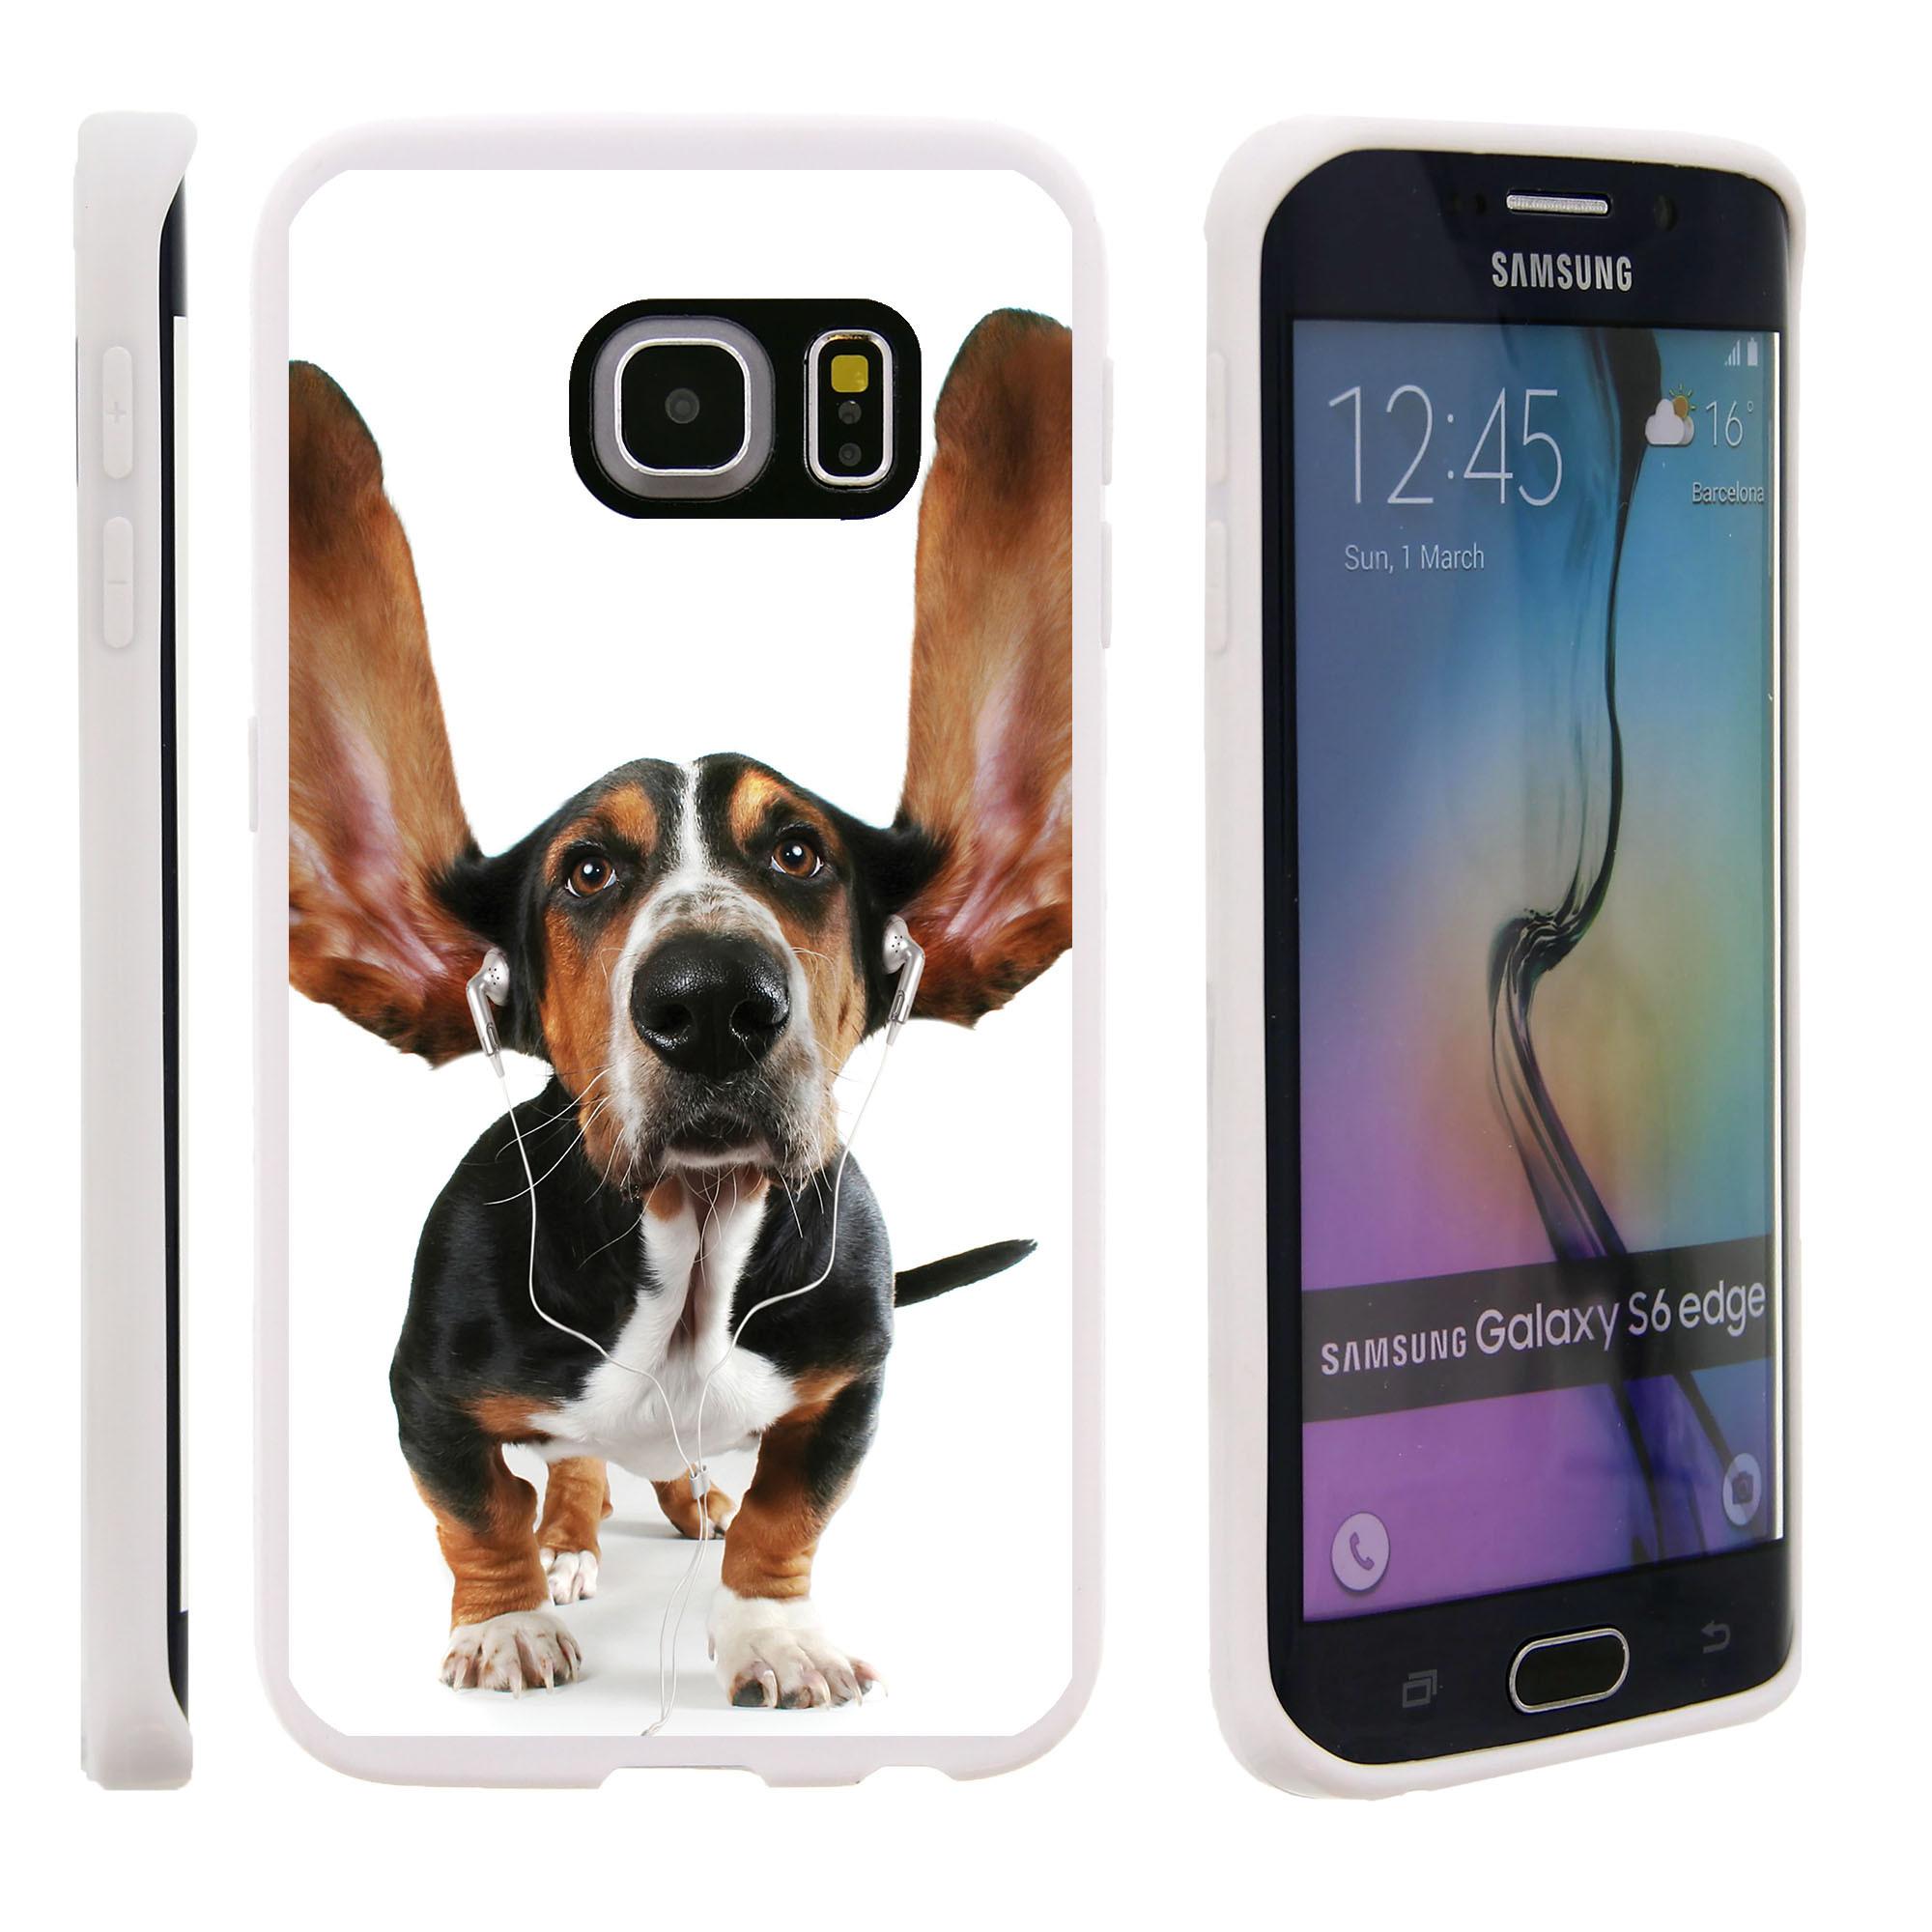 Samsung Galaxy S6 Edge G925, Flexible Case [FLEX FORCE] Slim Durable TPU Sleek Bumper with Unique Designs - Dog in Earphones